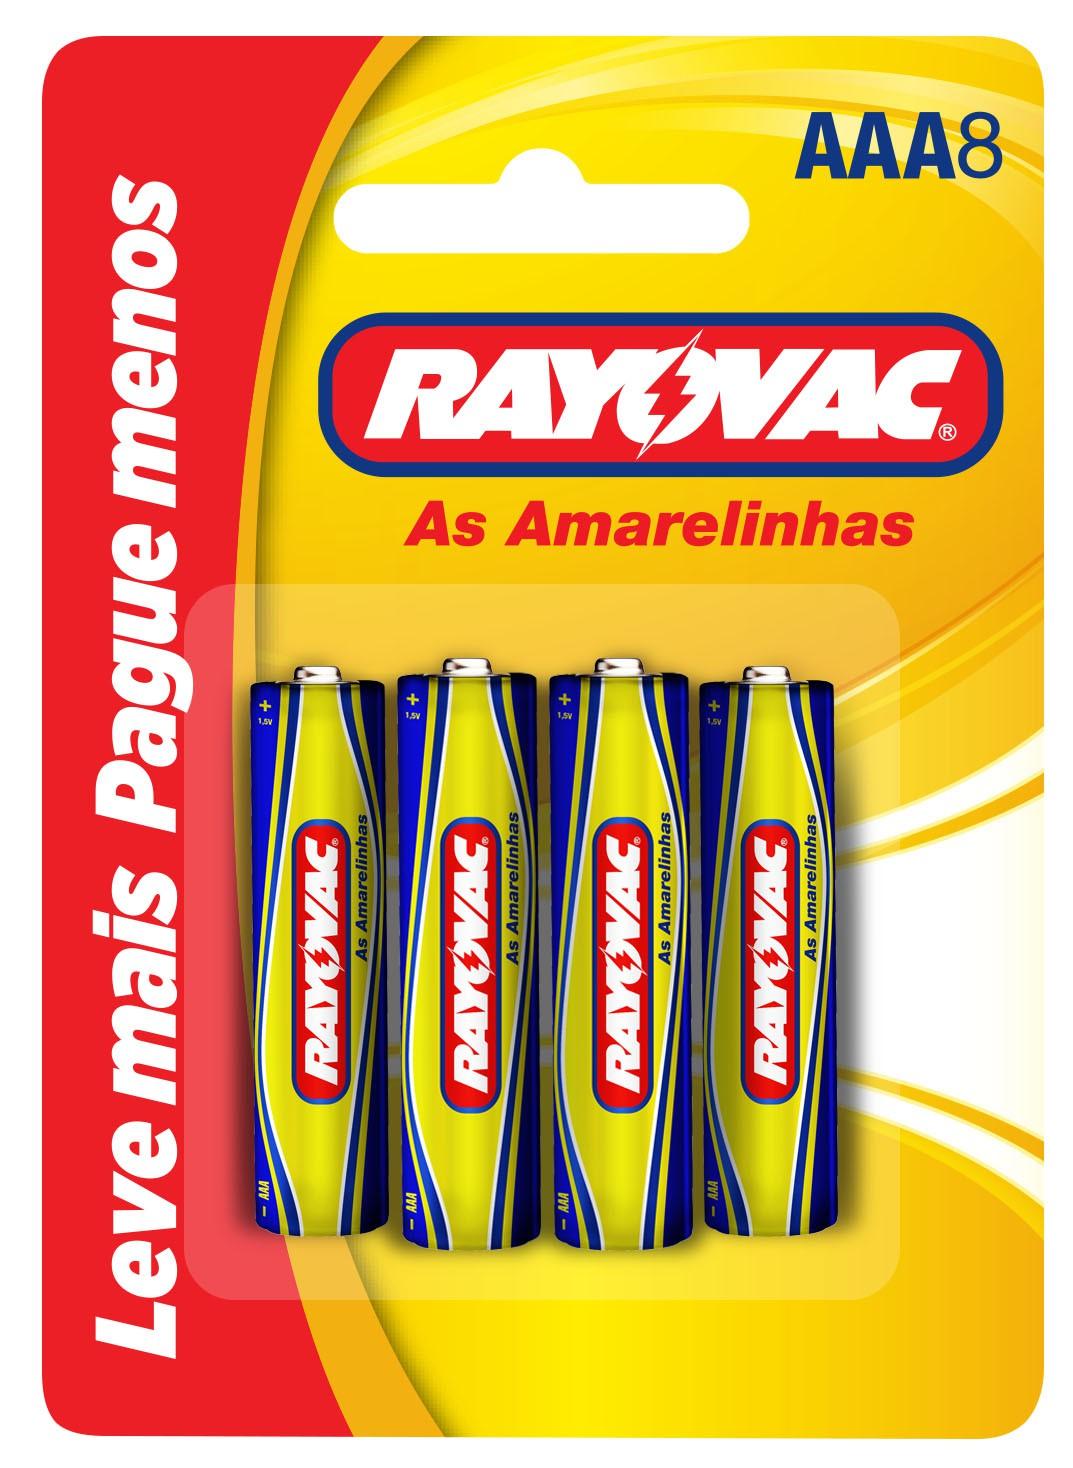 120 Pilhas AAA Zinco Carvão RAYOVAC 15 cartelas